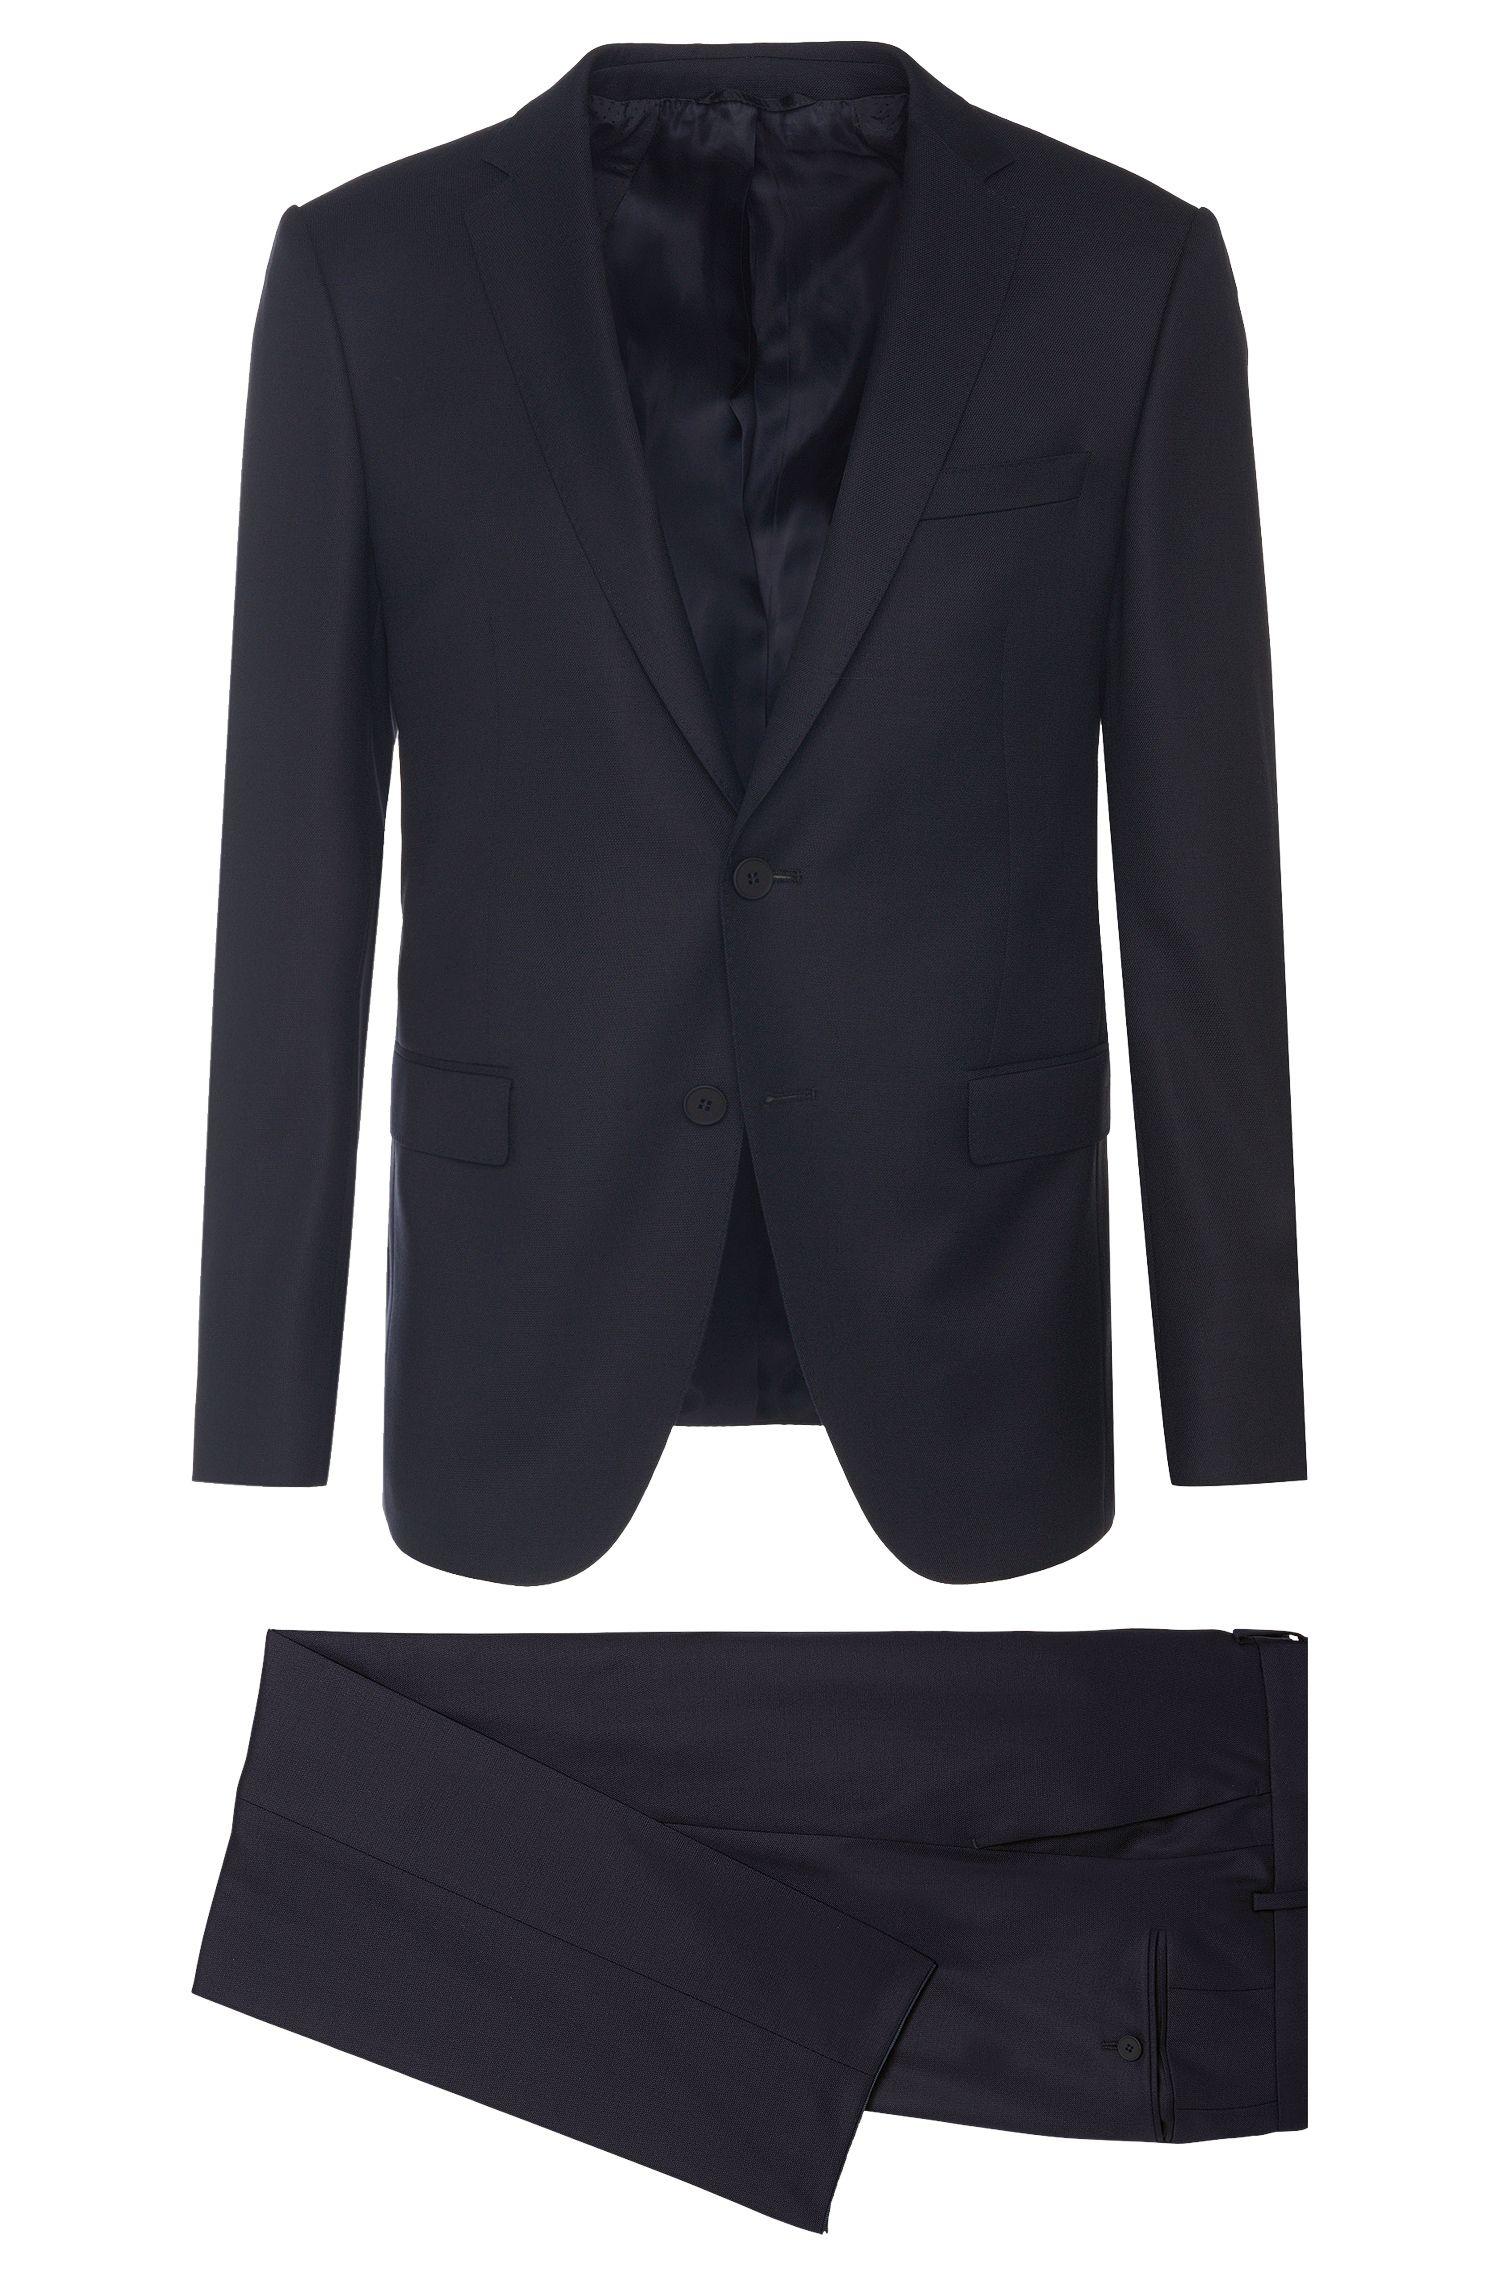 Super 120 Italian Wool Traveler Suit, Slim Fit | Nestro/Byte